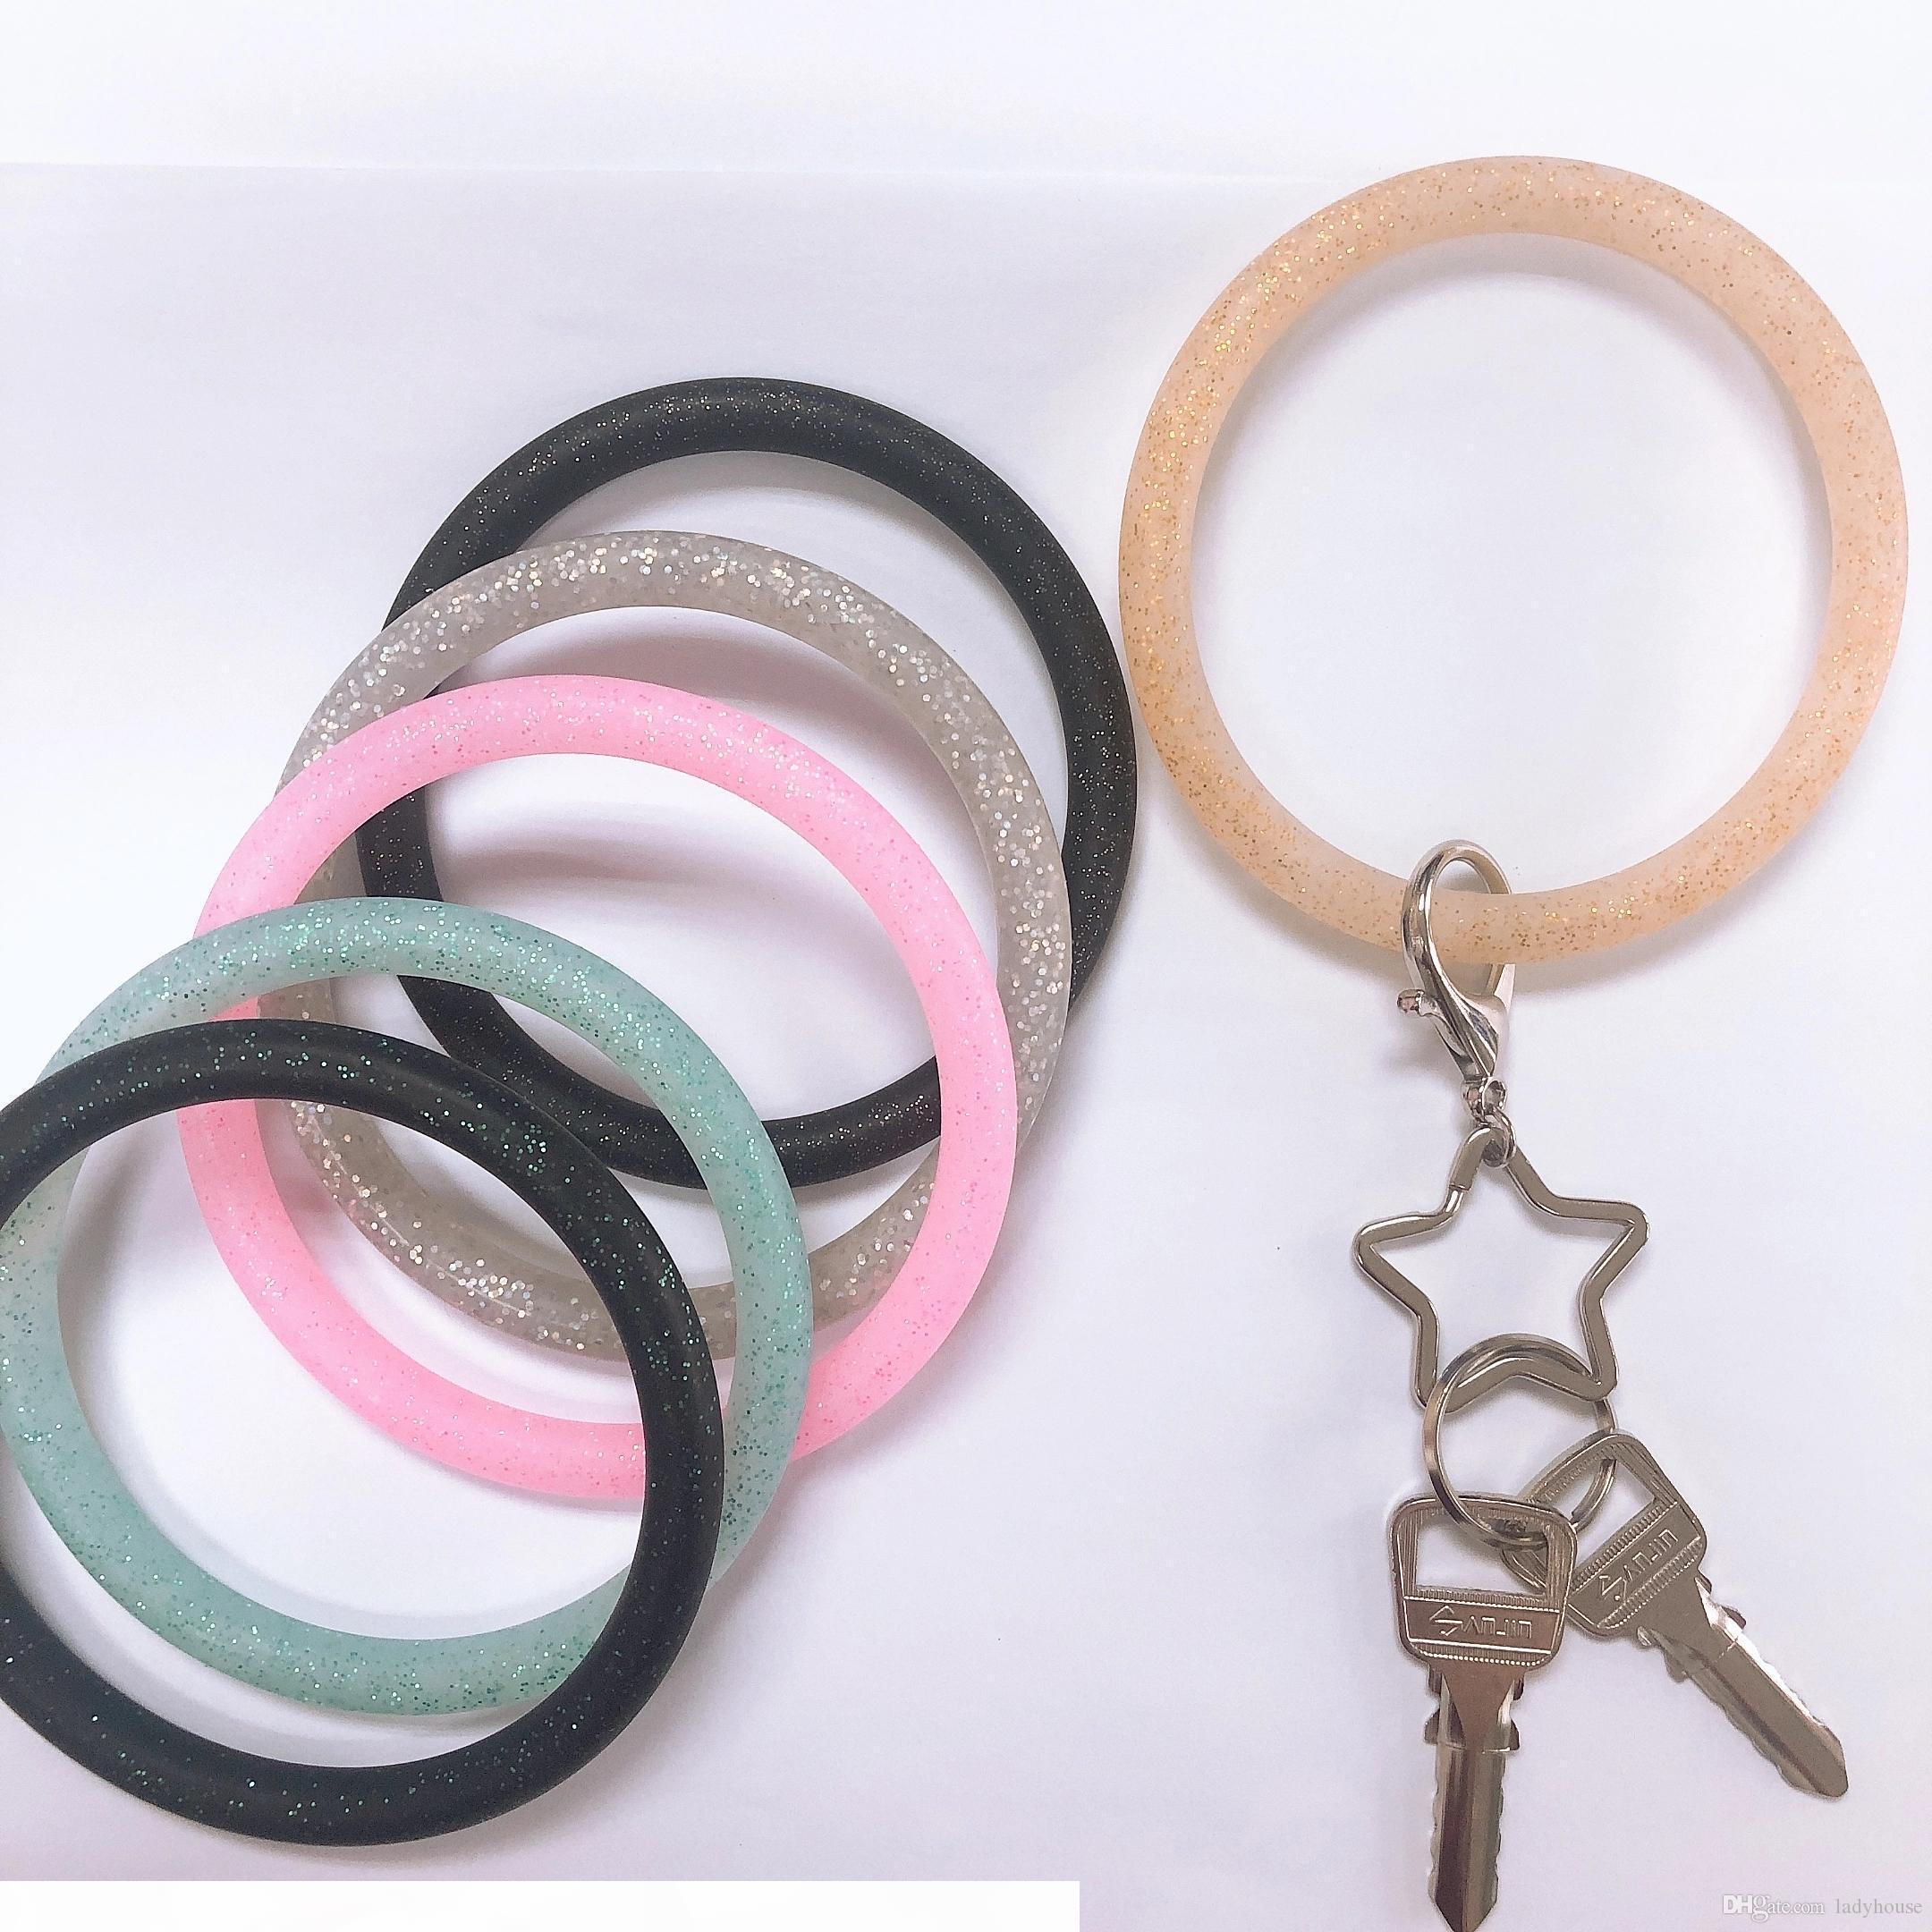 Neue Trend Silikon Bangle Key Ring Handgelenk Keychain Armband Runde Schlüssel Ringe Nette Schlüsselring Heiße Produkte